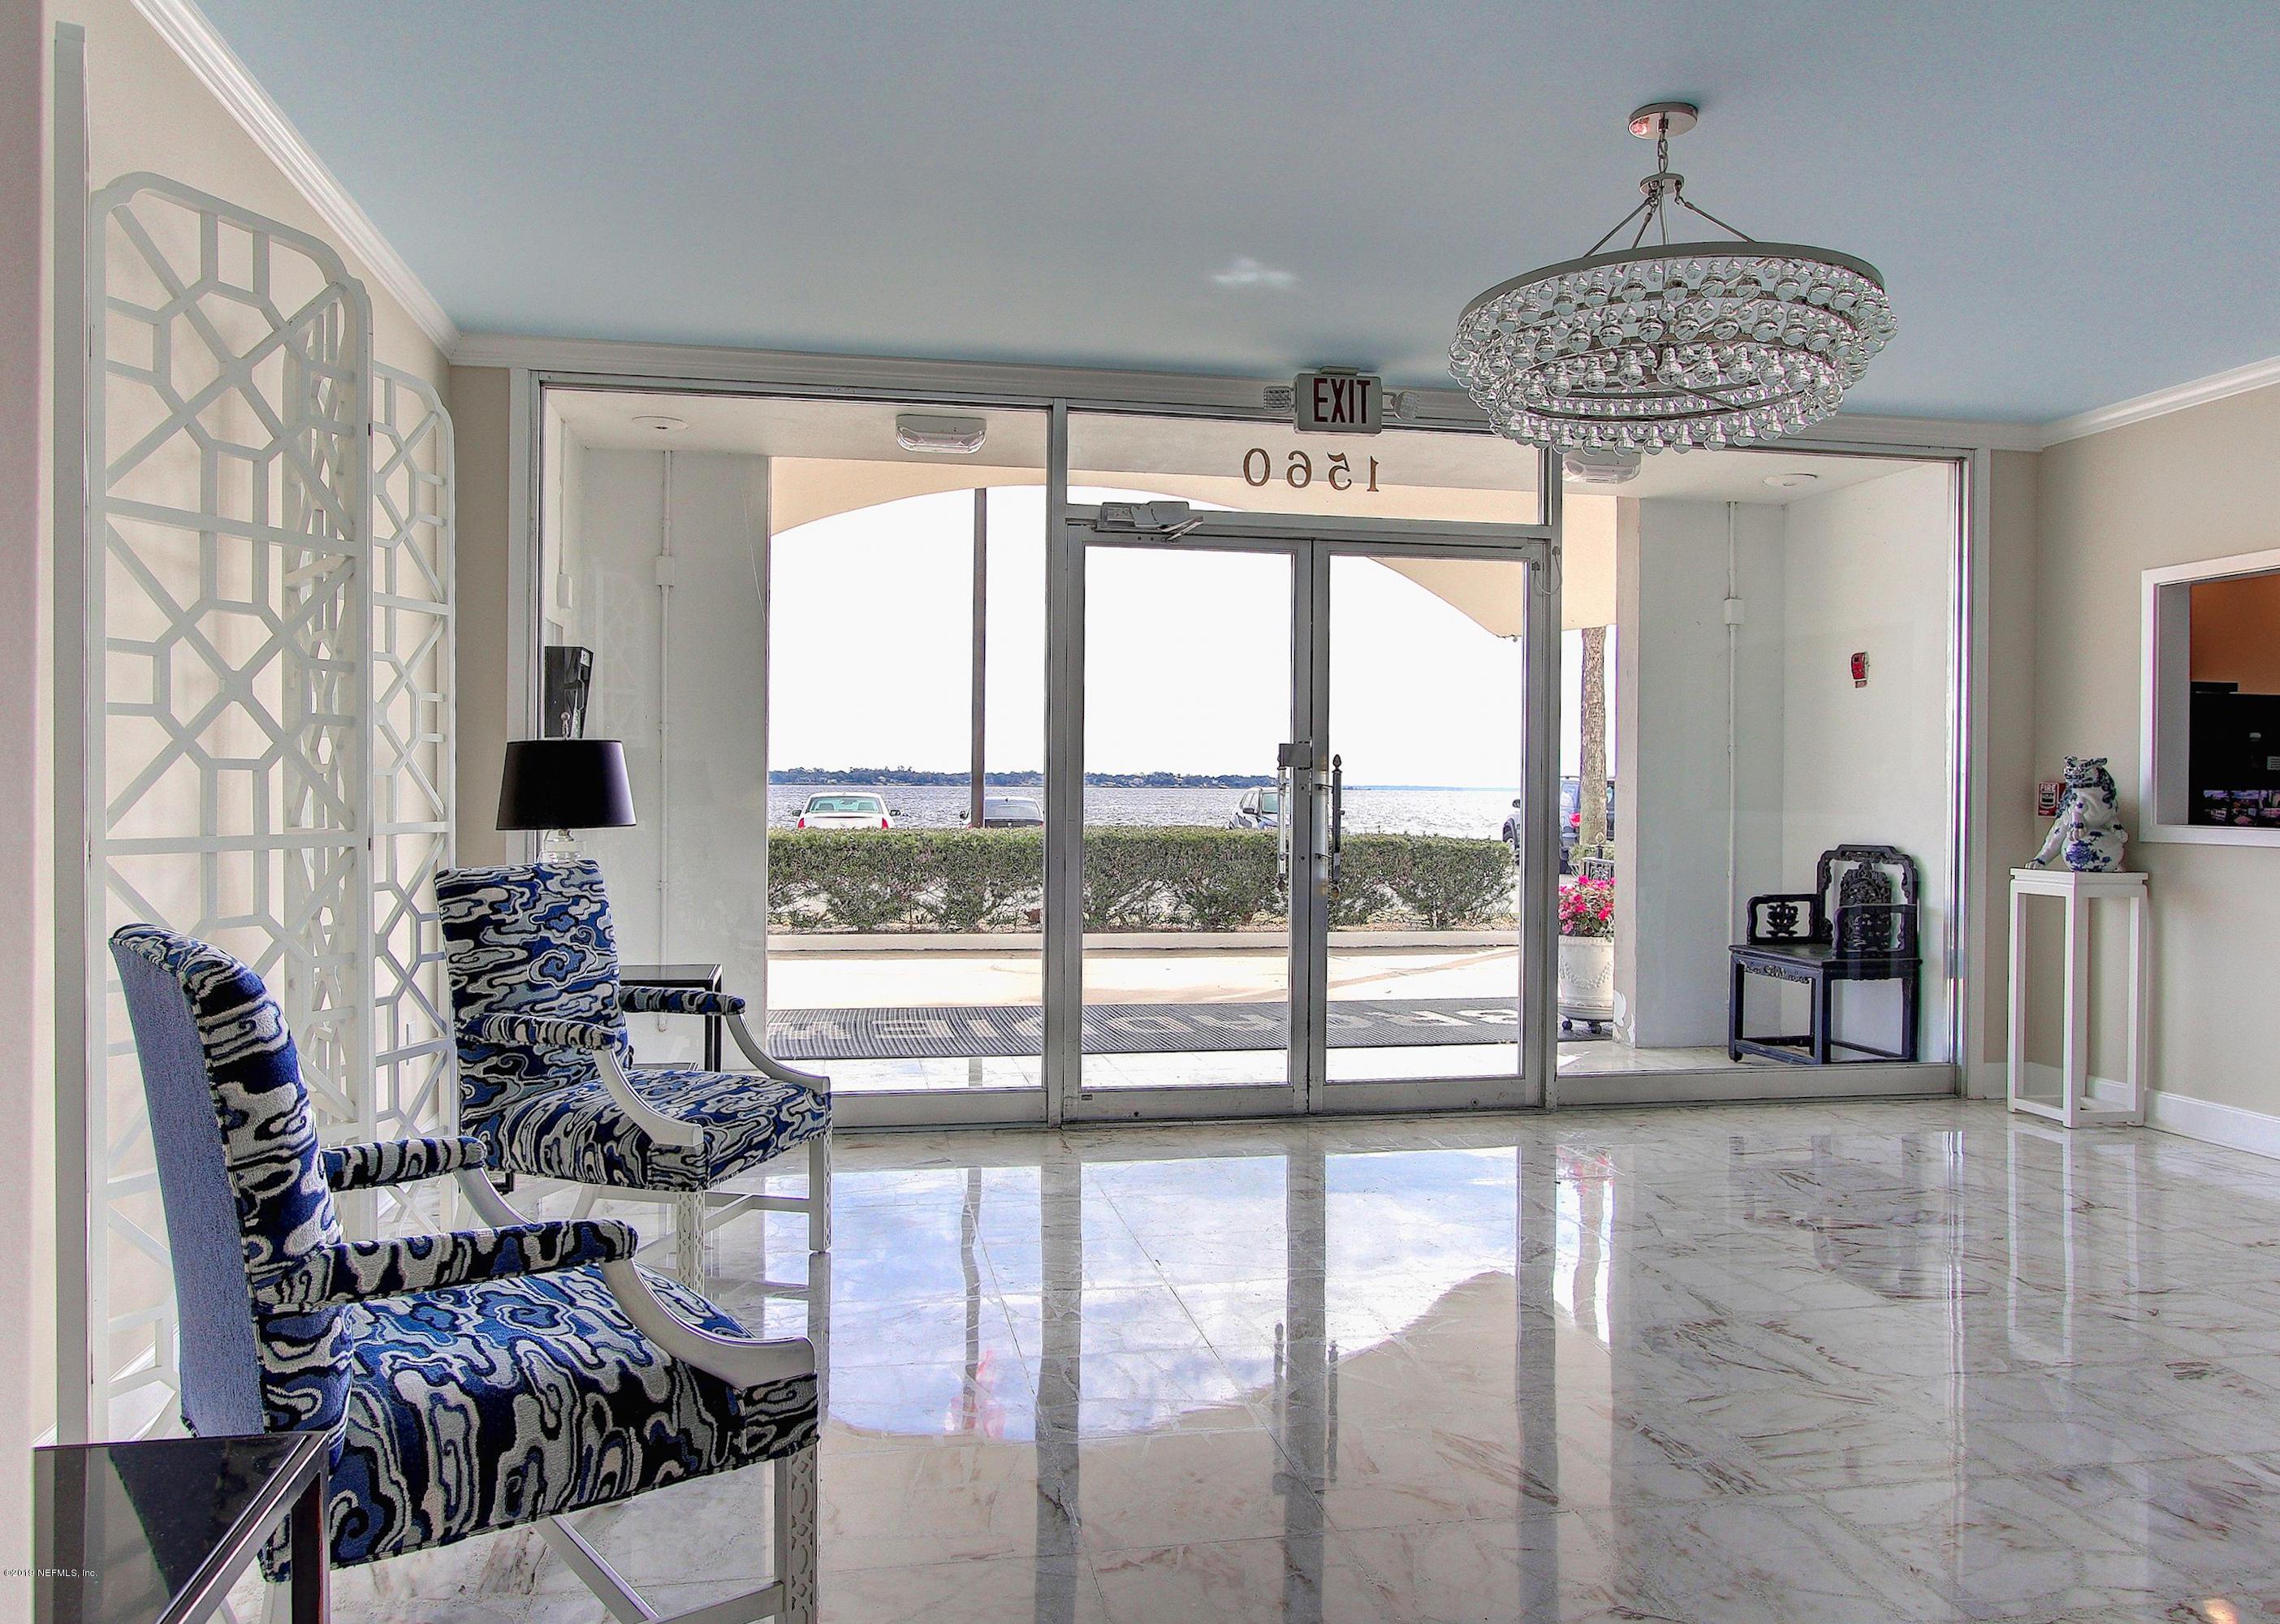 1560 LANCASTER, JACKSONVILLE, FLORIDA 32204, 1 Bedroom Bedrooms, ,1 BathroomBathrooms,For sale,LANCASTER,1022636